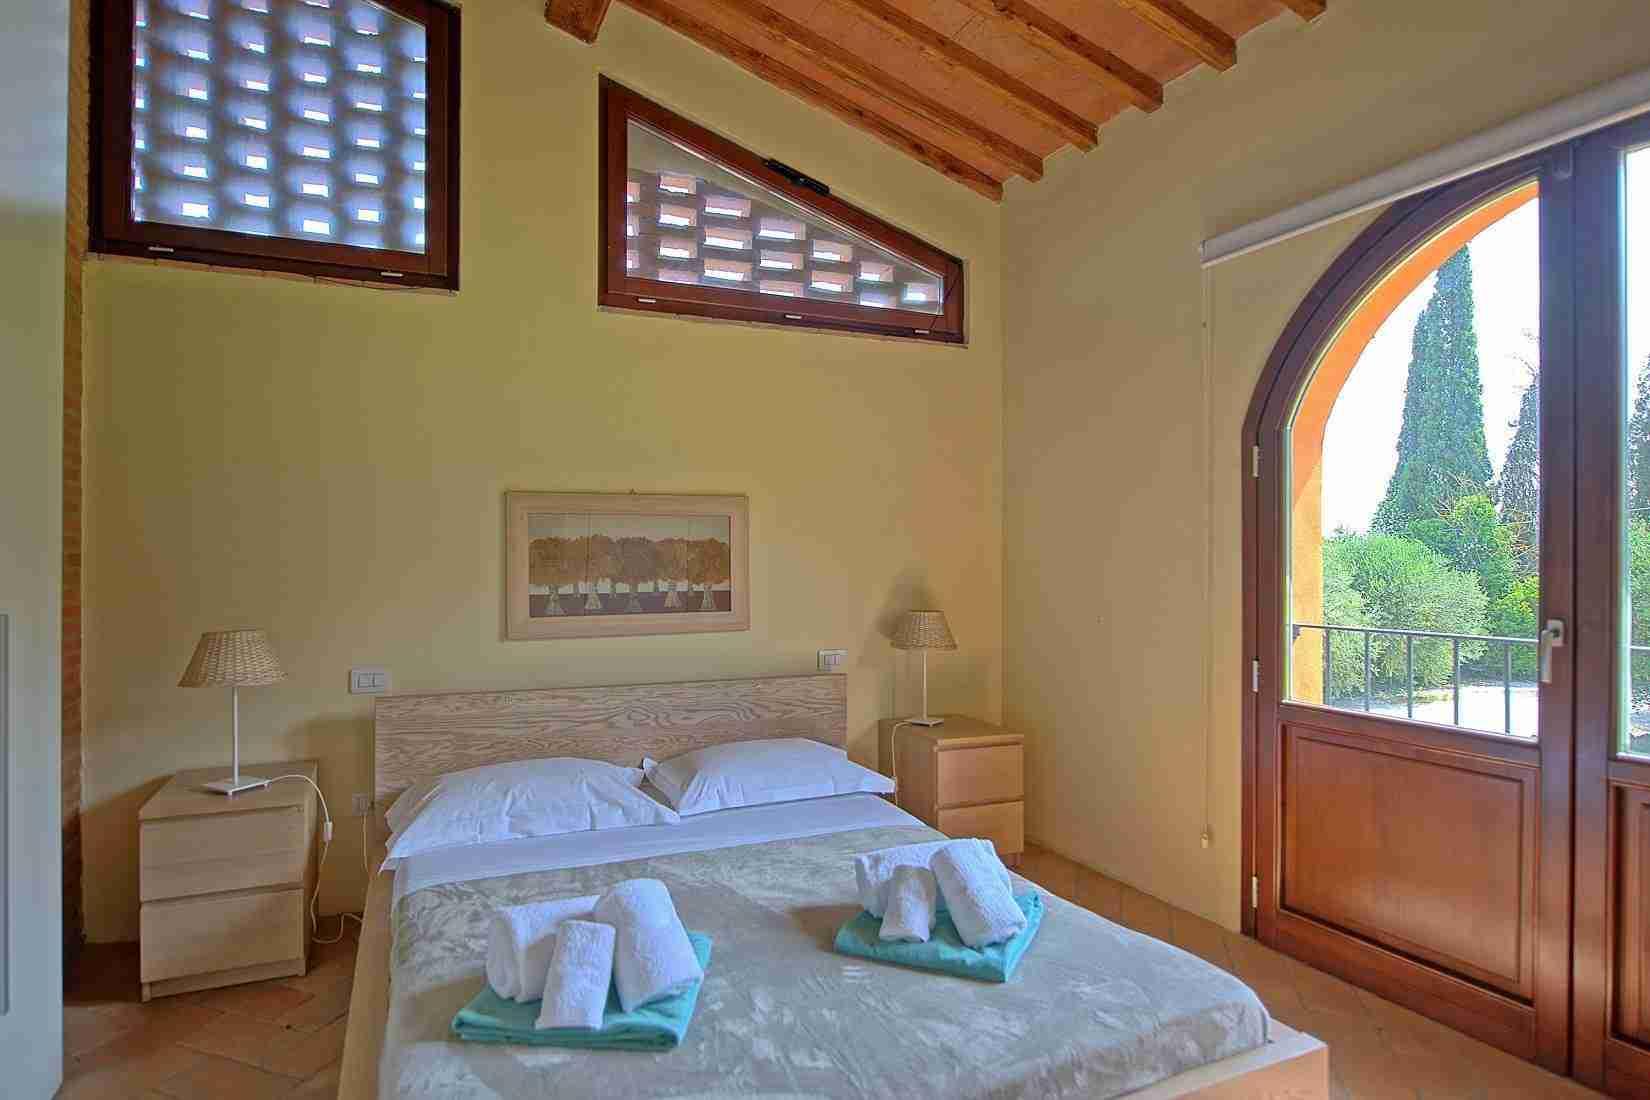 14 Ranieri double bedroom